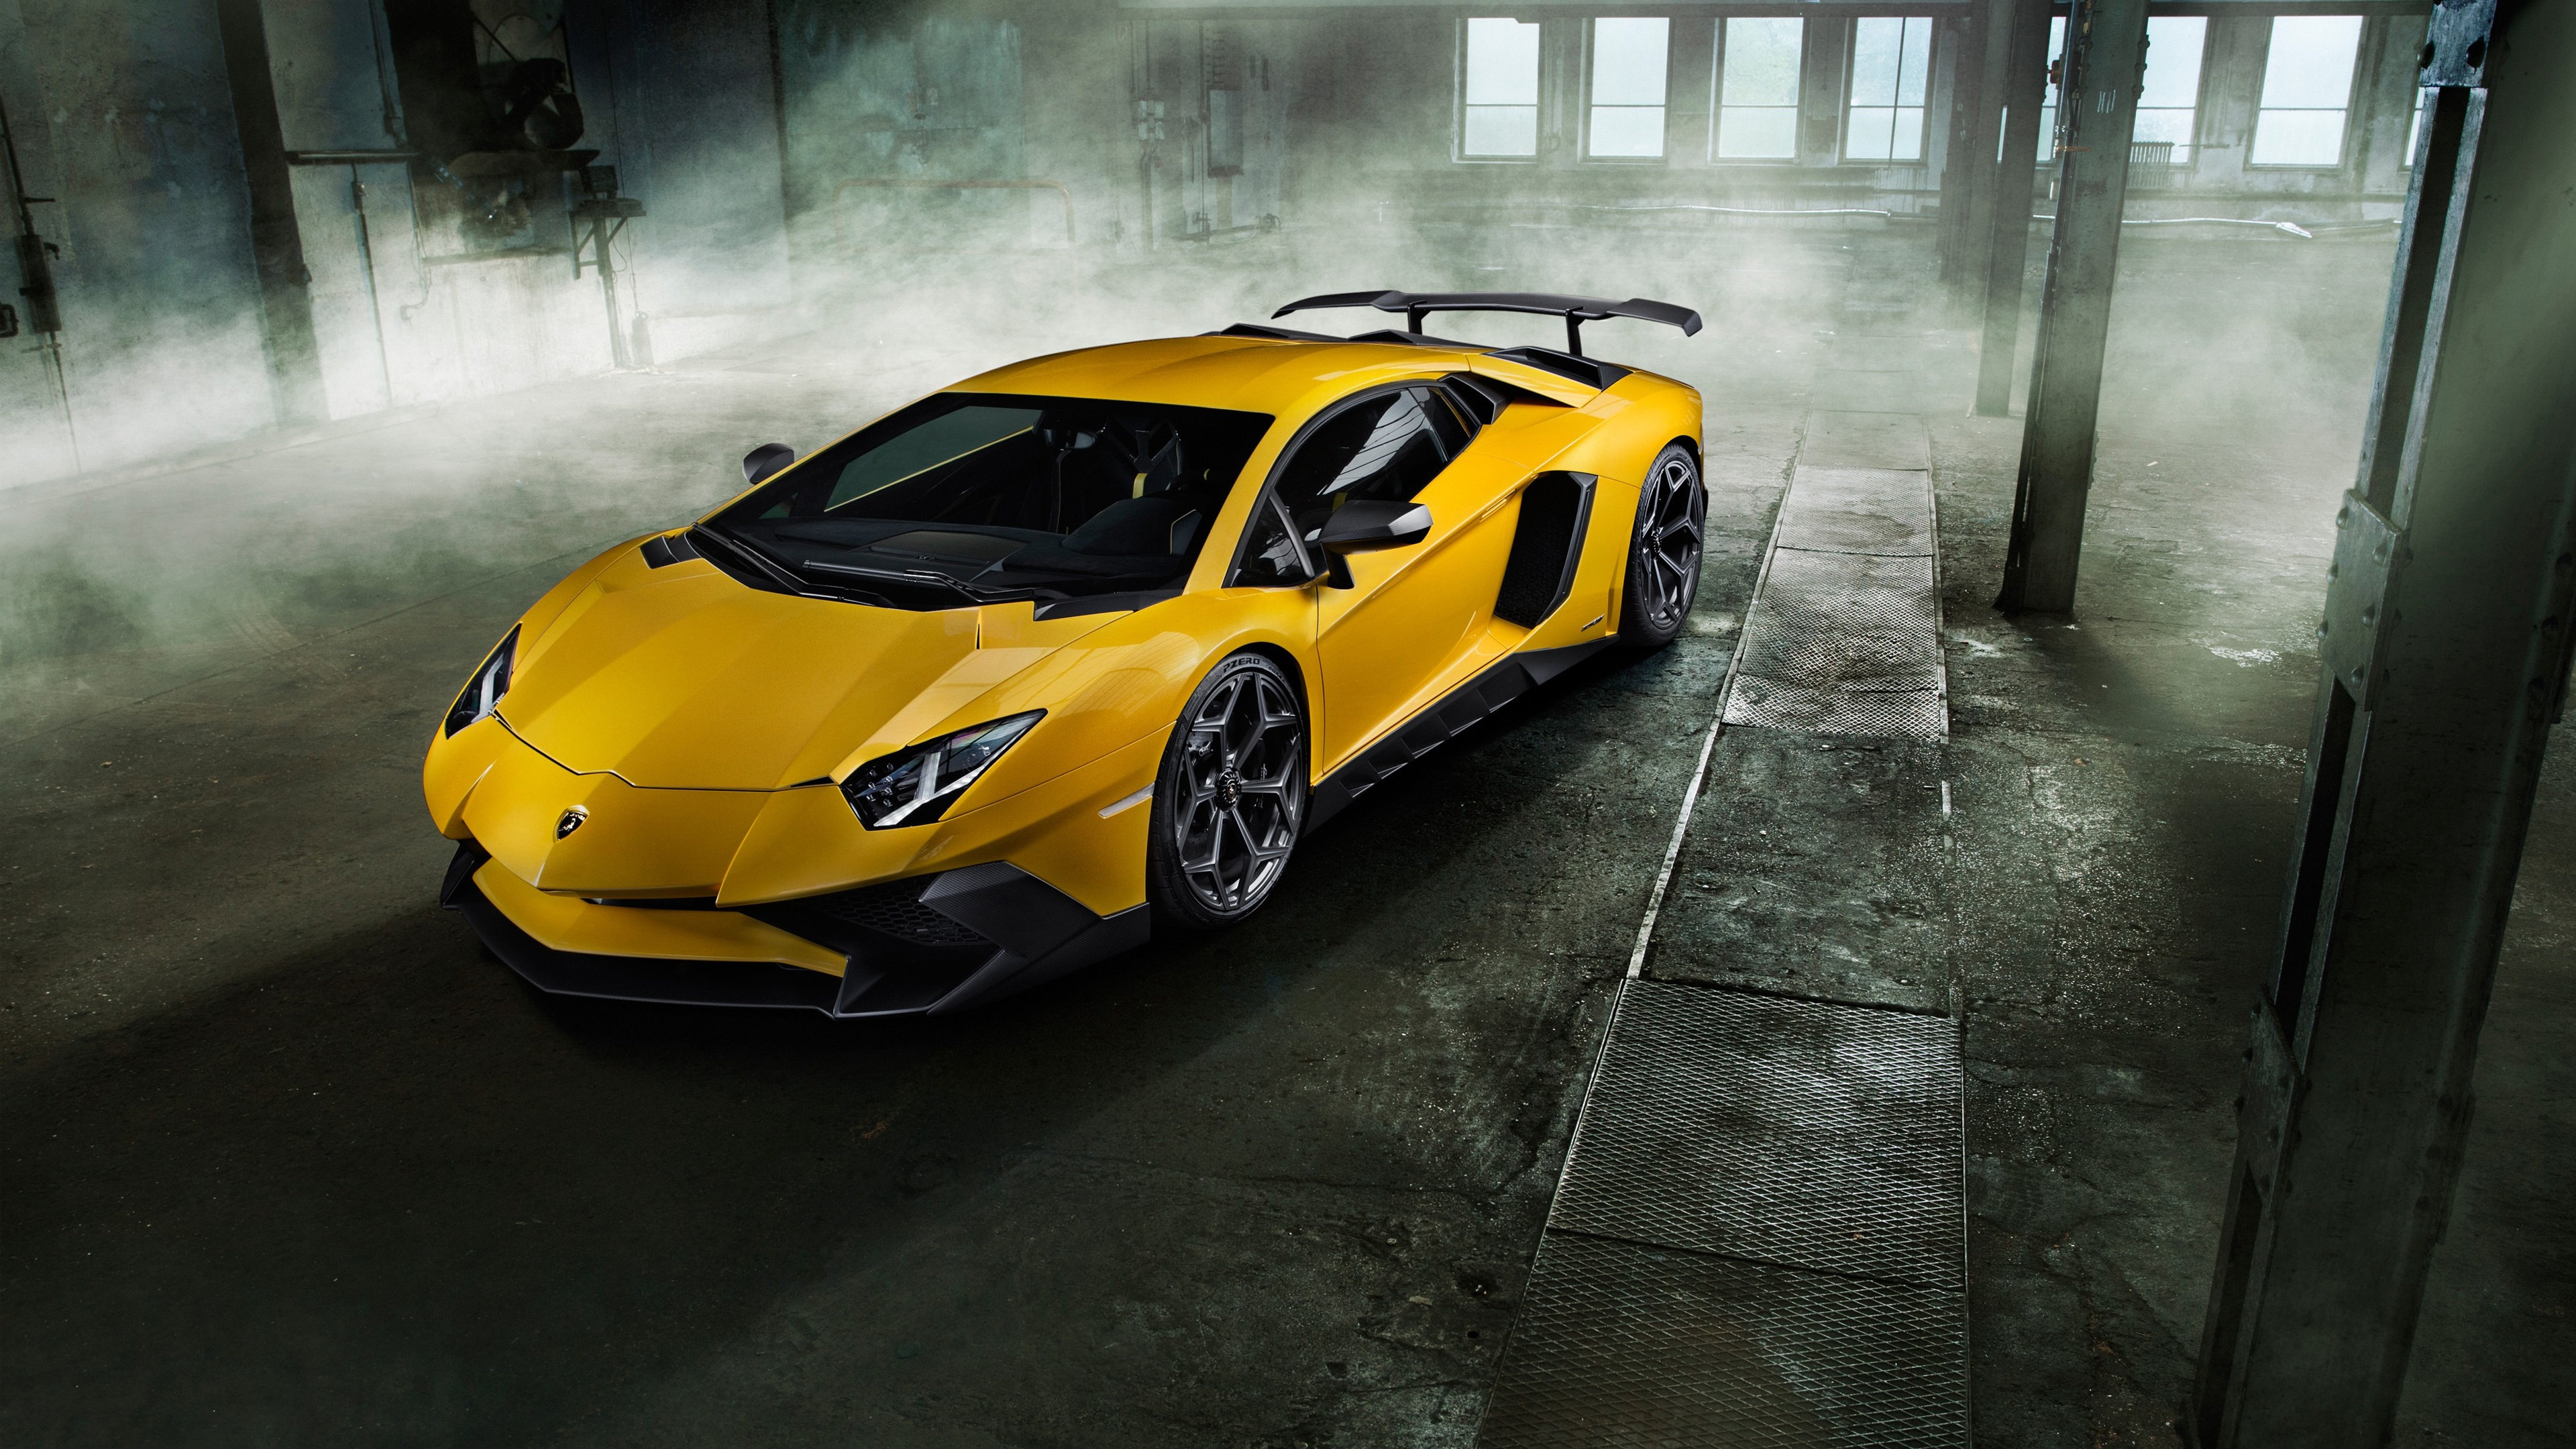 Permalink to Lamborghini Aventador 2017